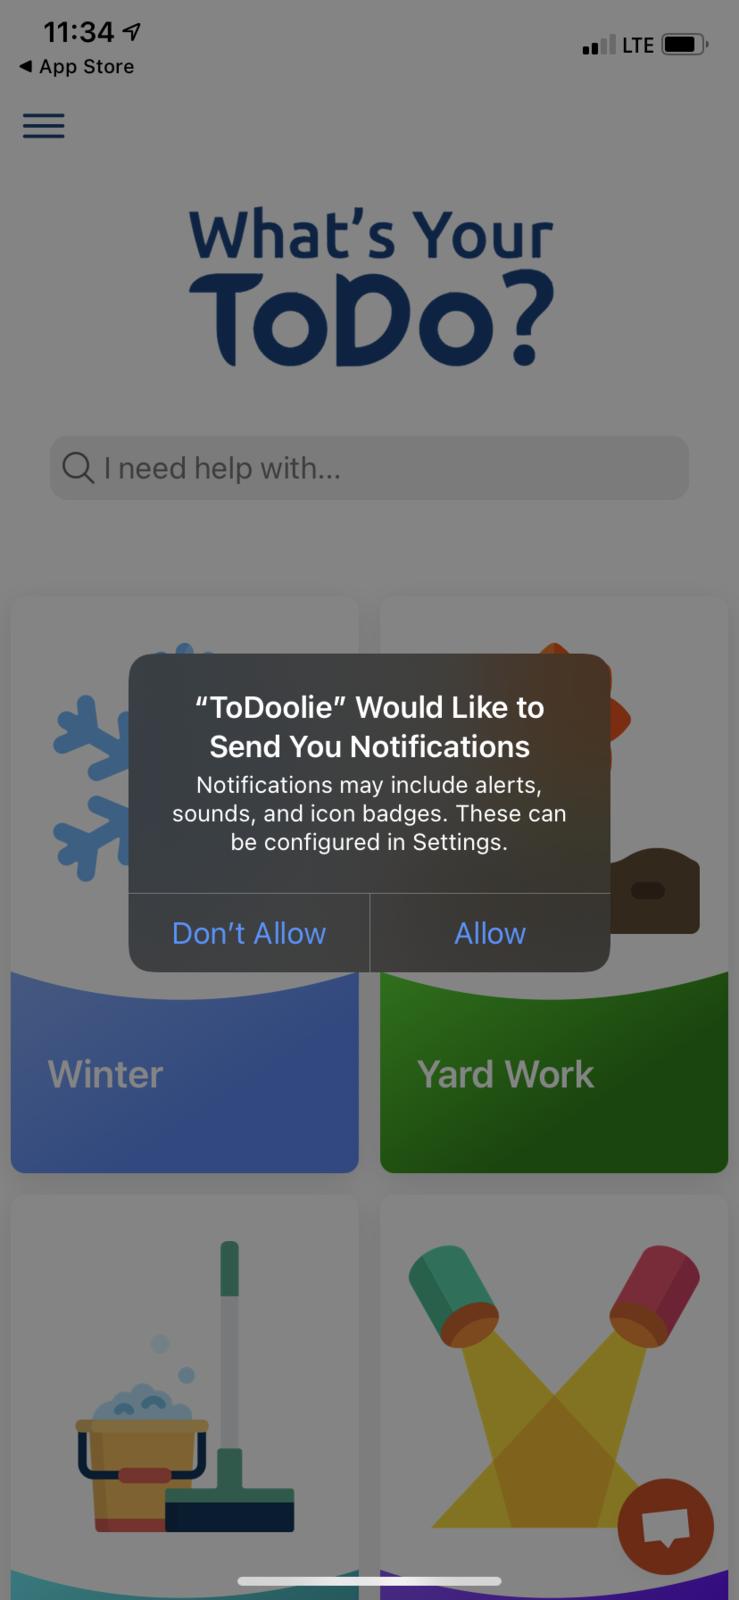 Turn On NotificationsAlert Box